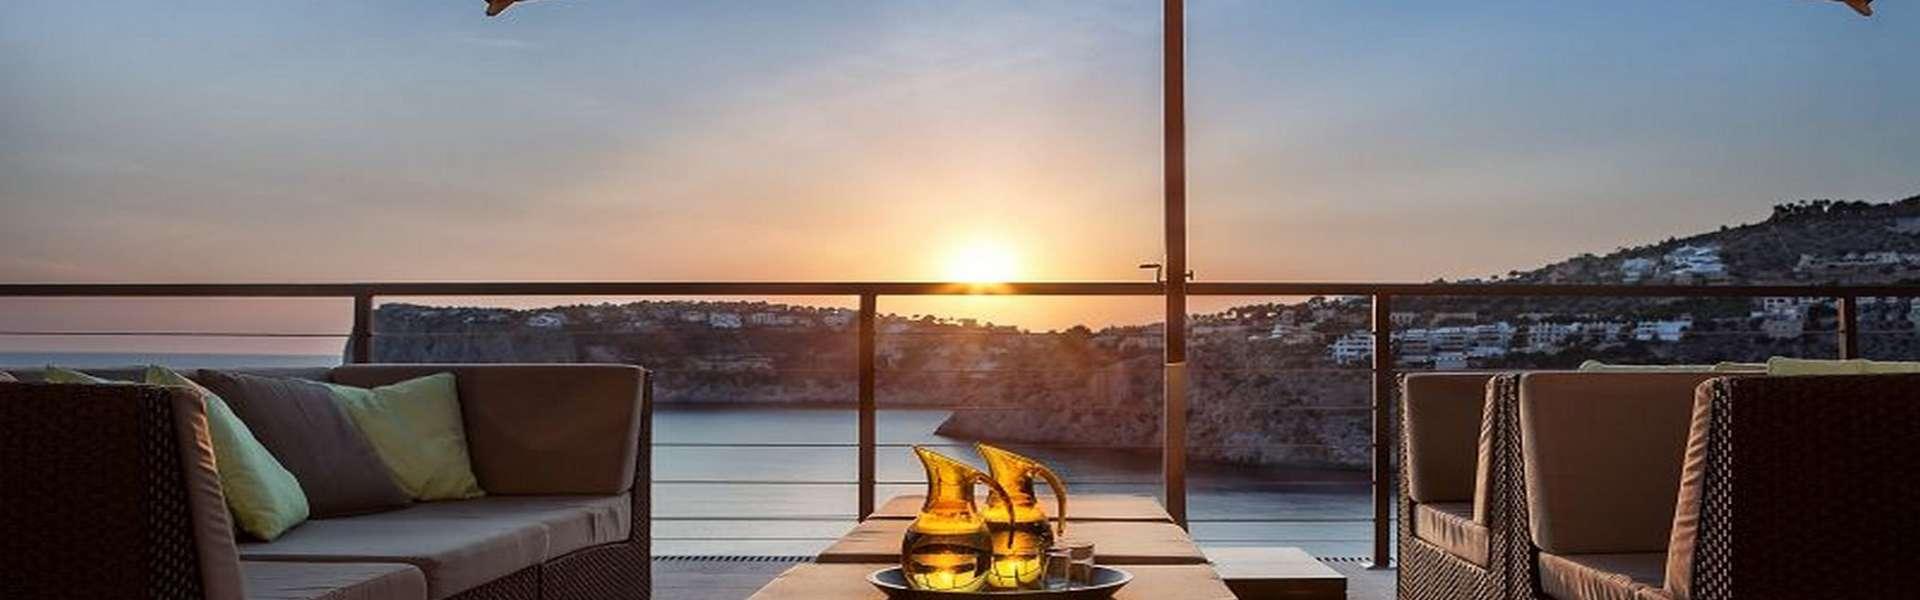 Port d'Andratx/Cala Llamp - Ein Unikat mit Skyline-Blick